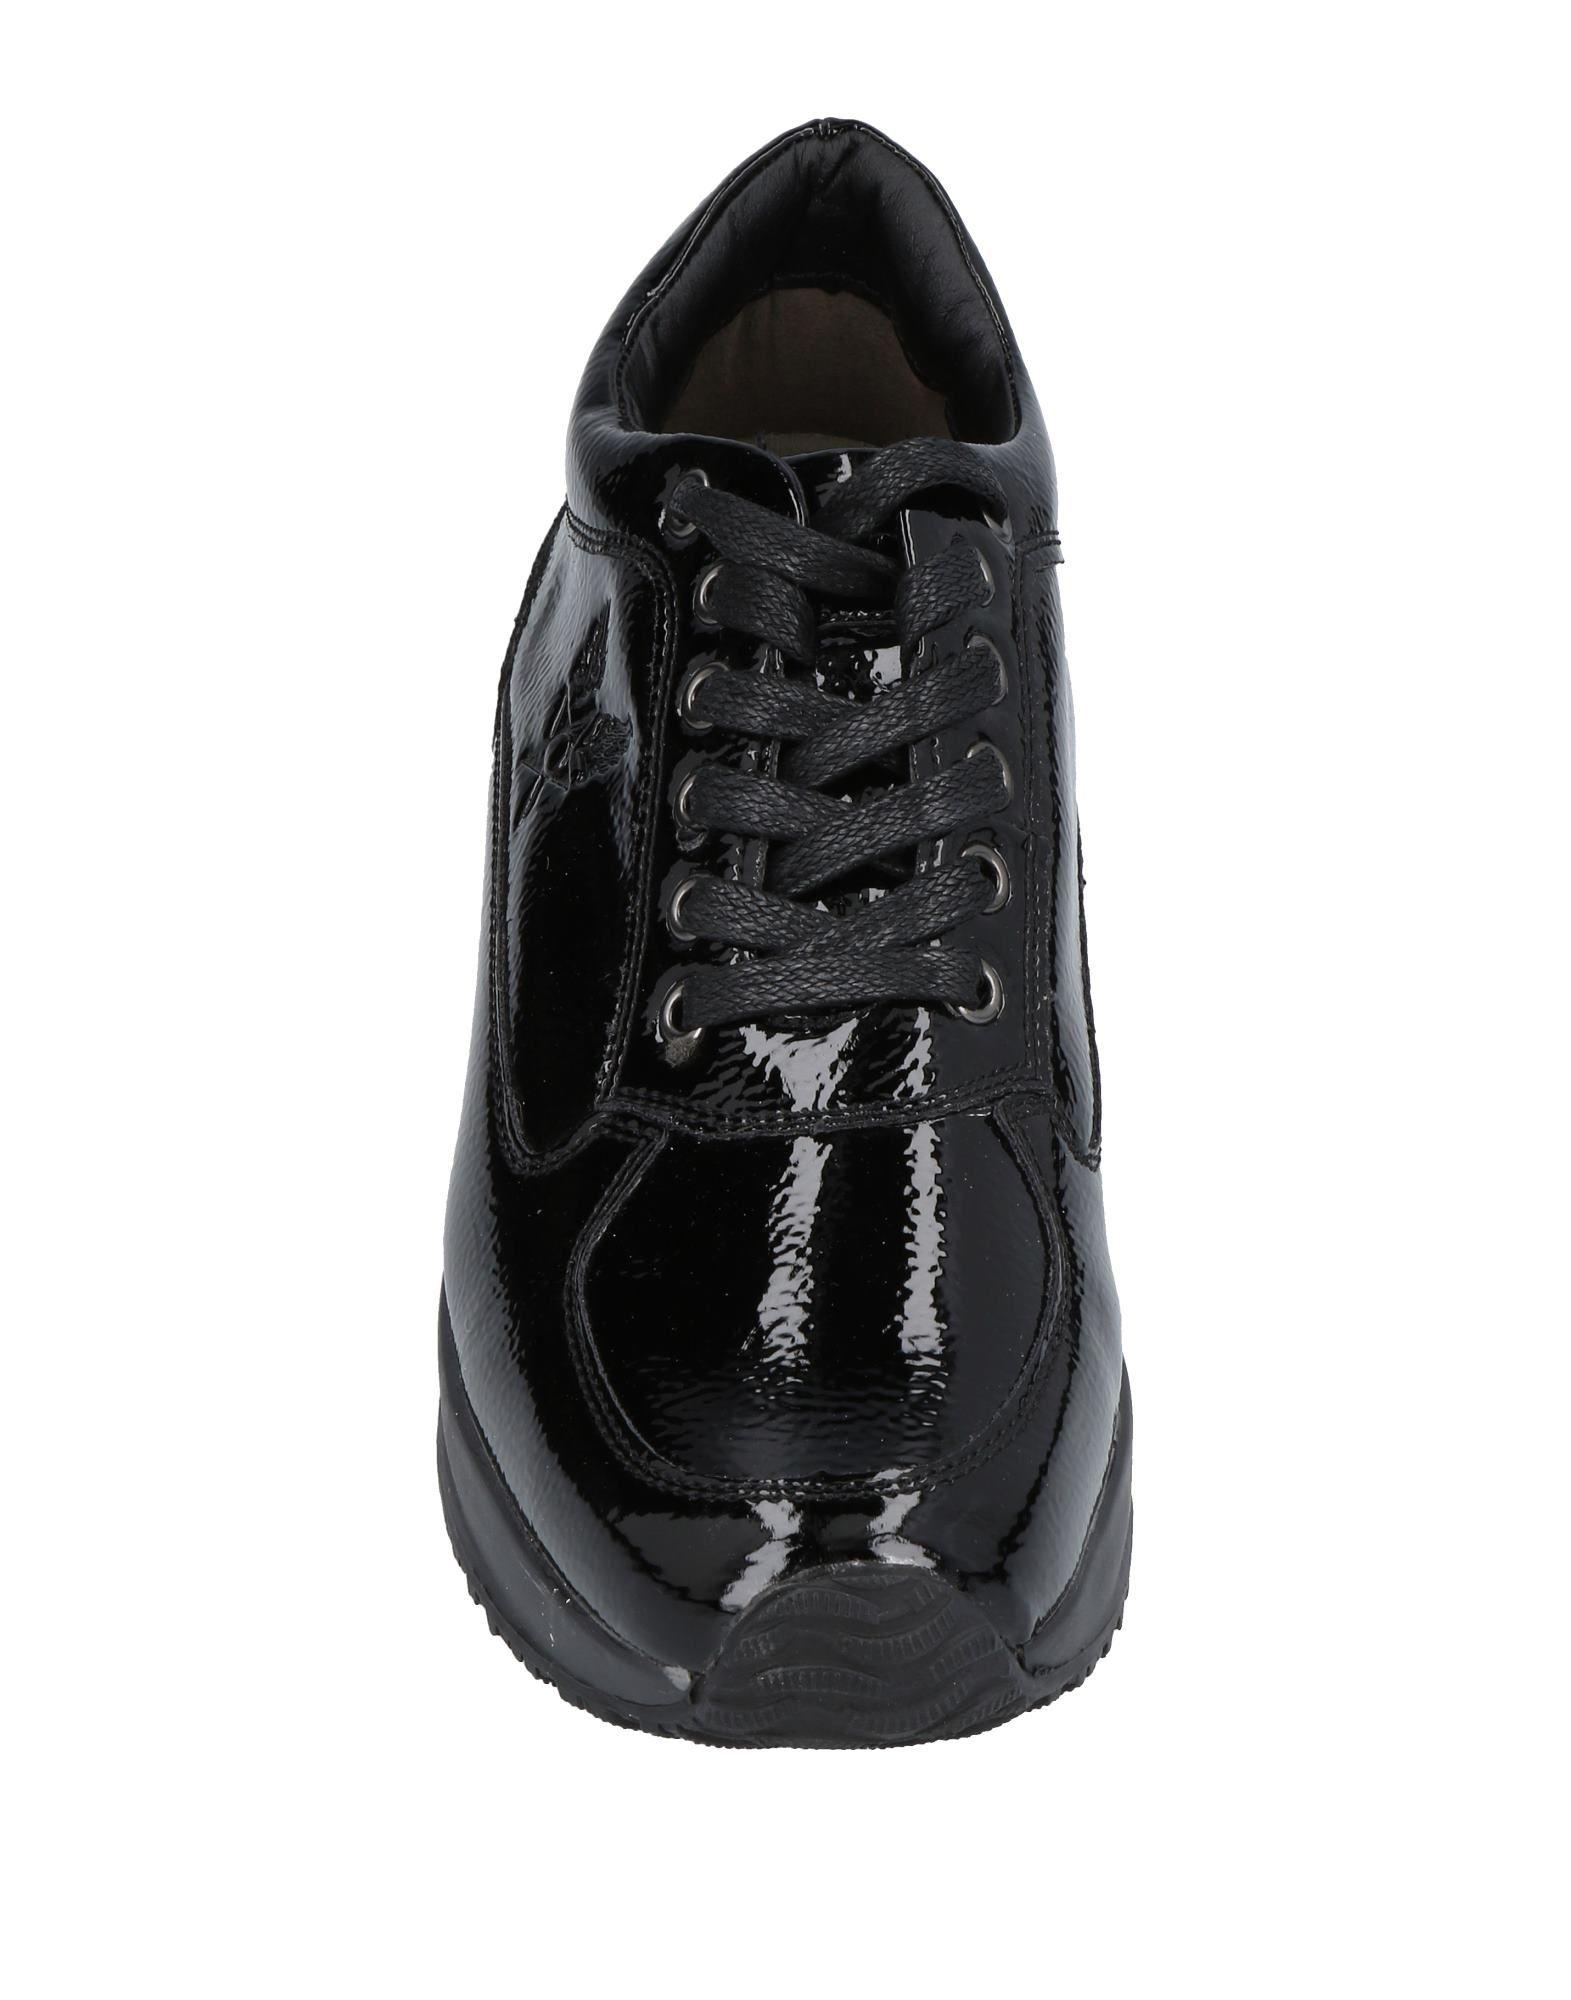 Avirex Sneakers Damen Damen Sneakers  11454253MC 1c34b3